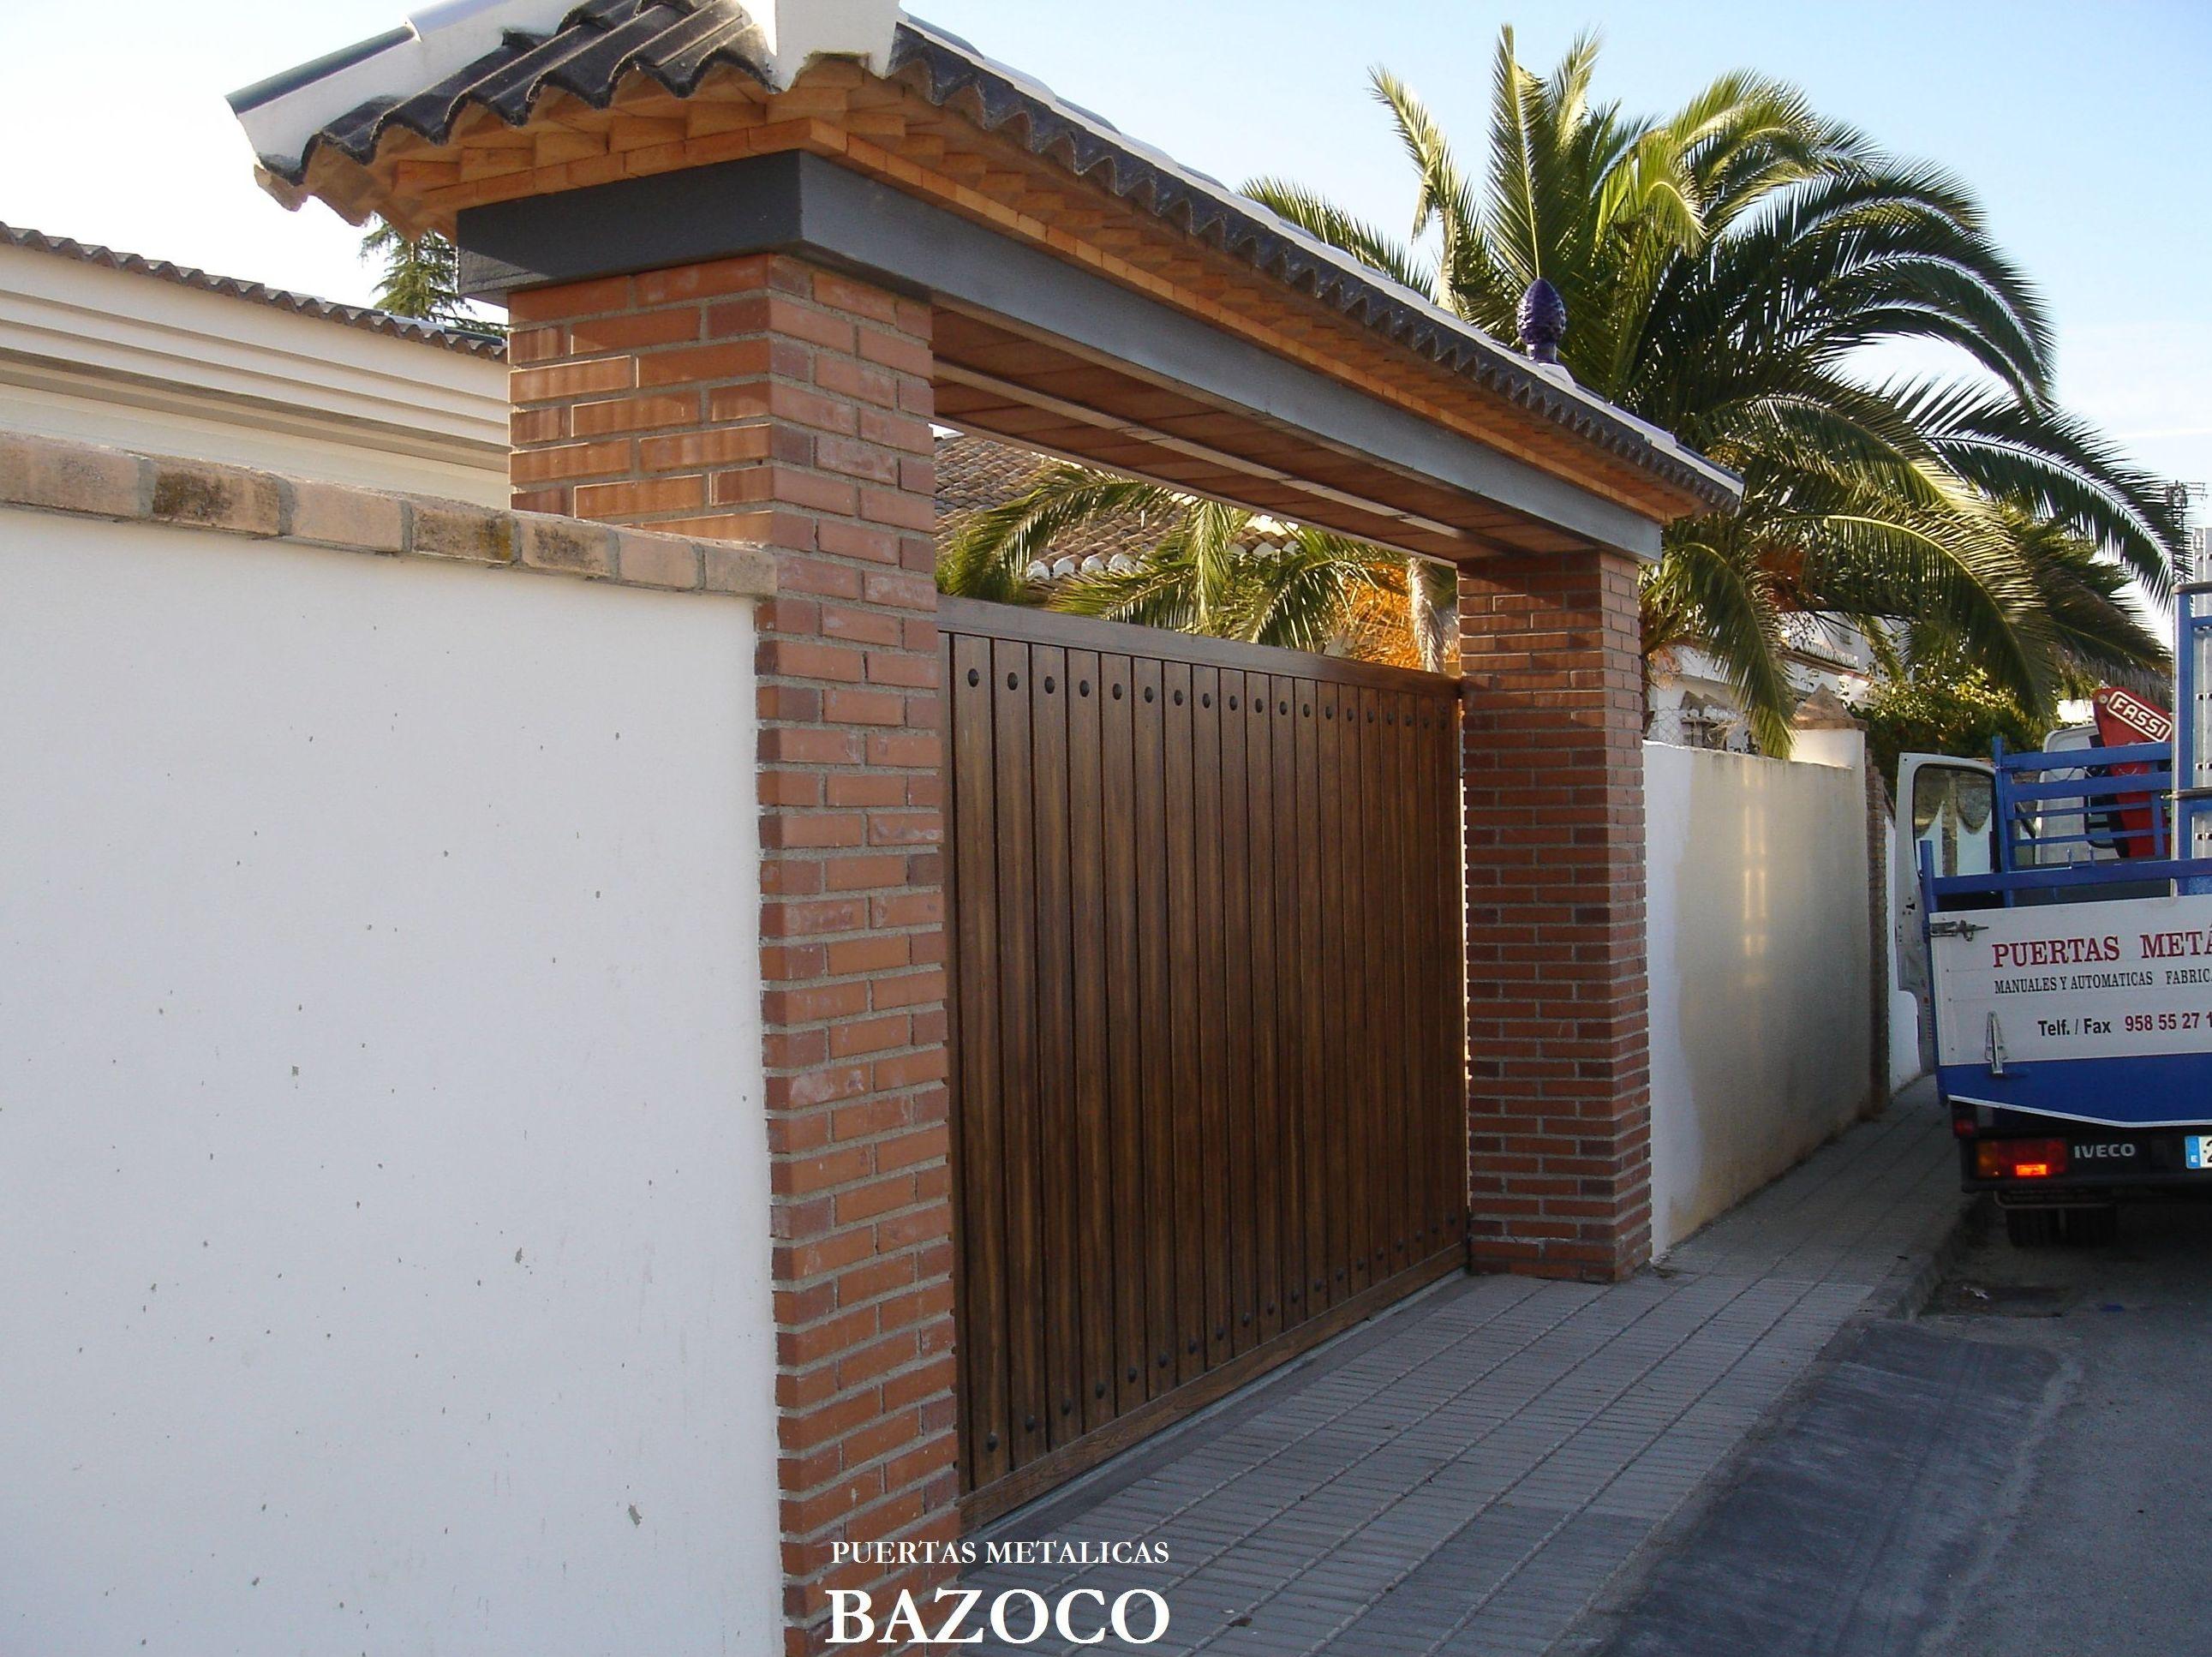 Puerta corredera metalica exterior top puerta corredera metalica exterior with puerta corredera - Puerta exterior metalica ...